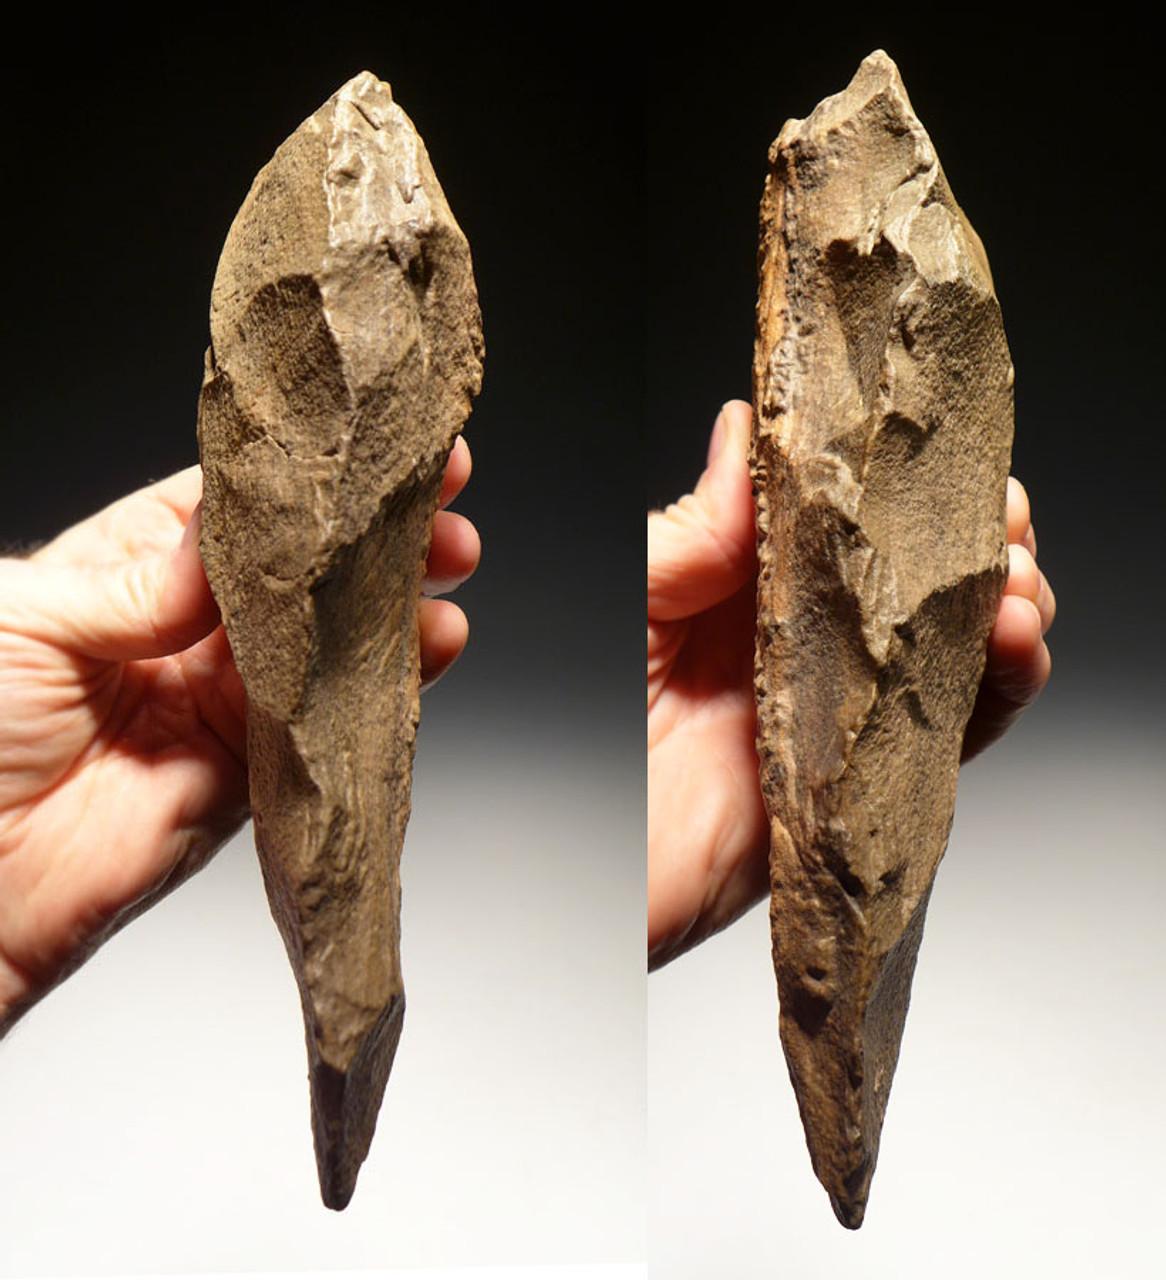 ACH224 - LARGE MUSEUM GRADE MASTERPIECE AFRICAN ACHEULIAN HAND AXE MADE BY HOMO ERECTUS (ERGASTER)